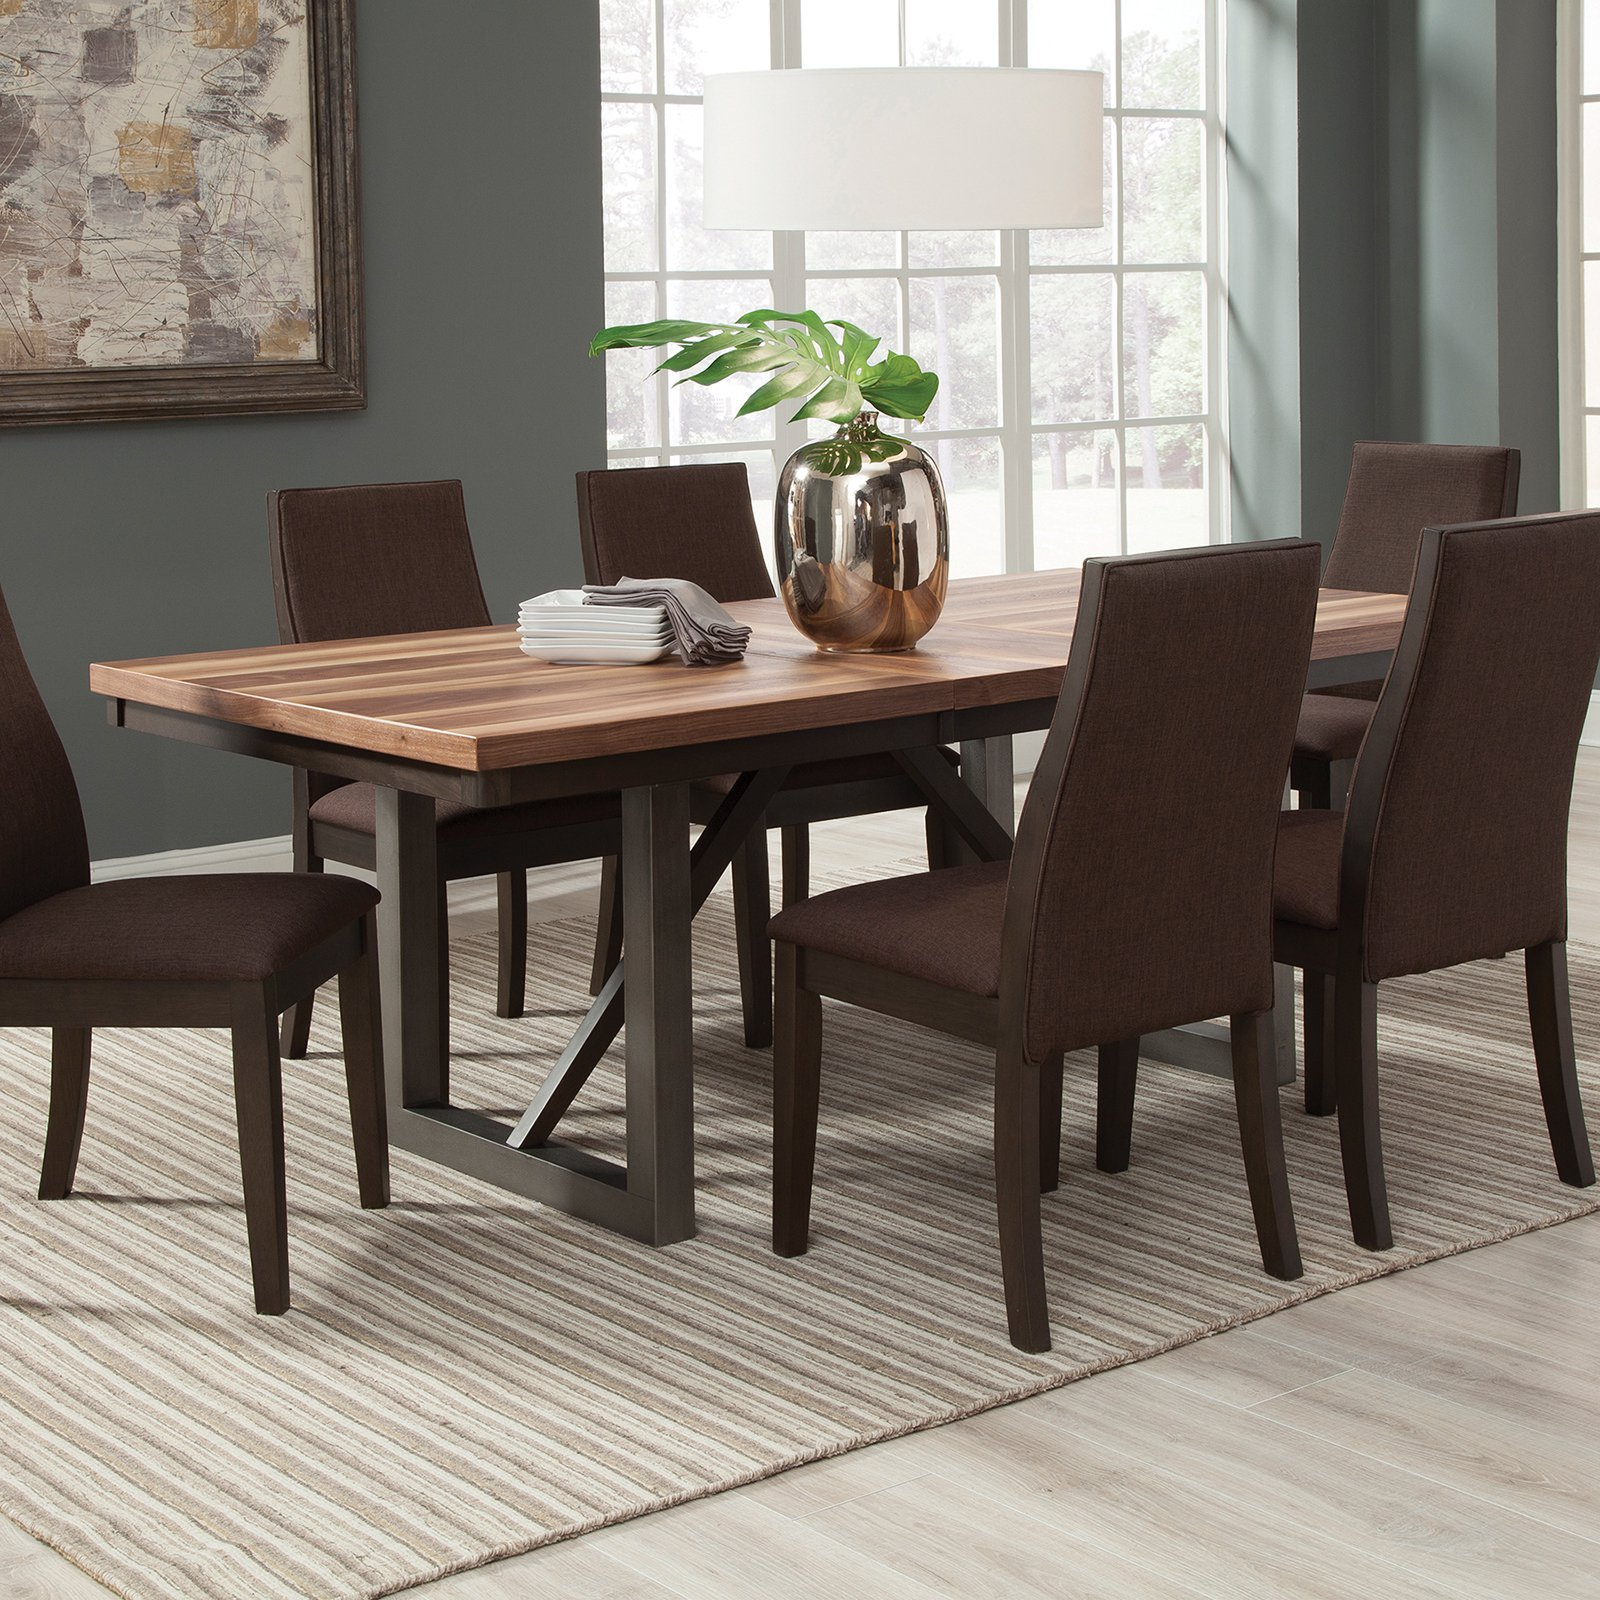 Coaster Furniture Spring Creek Dining Table